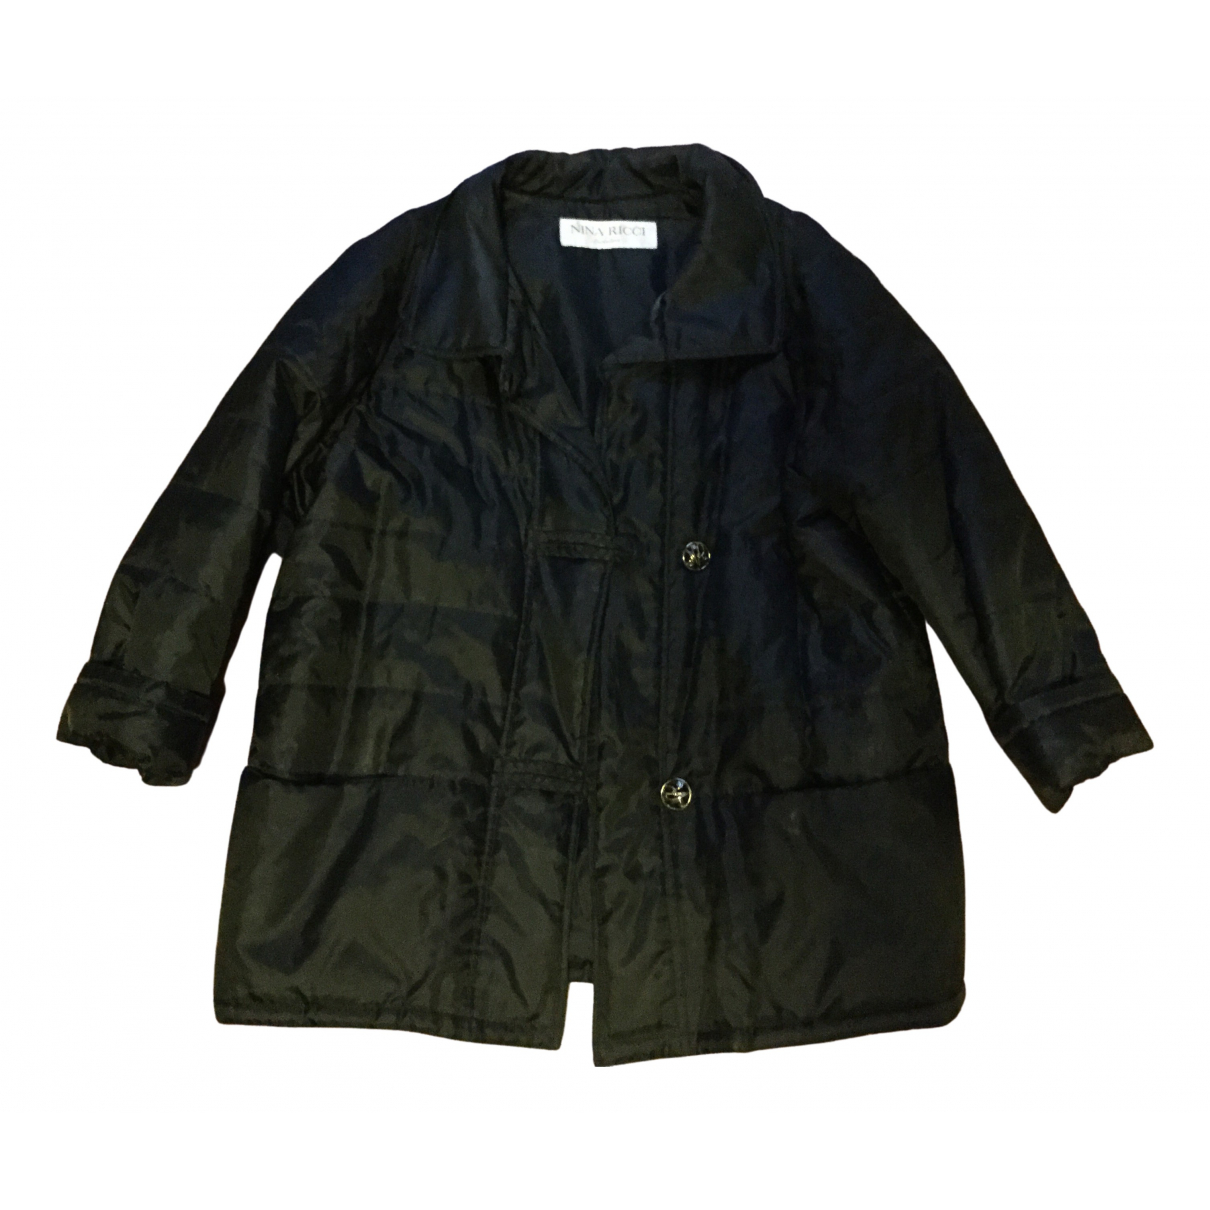 Nina Ricci \N Black coat for Women 40 FR